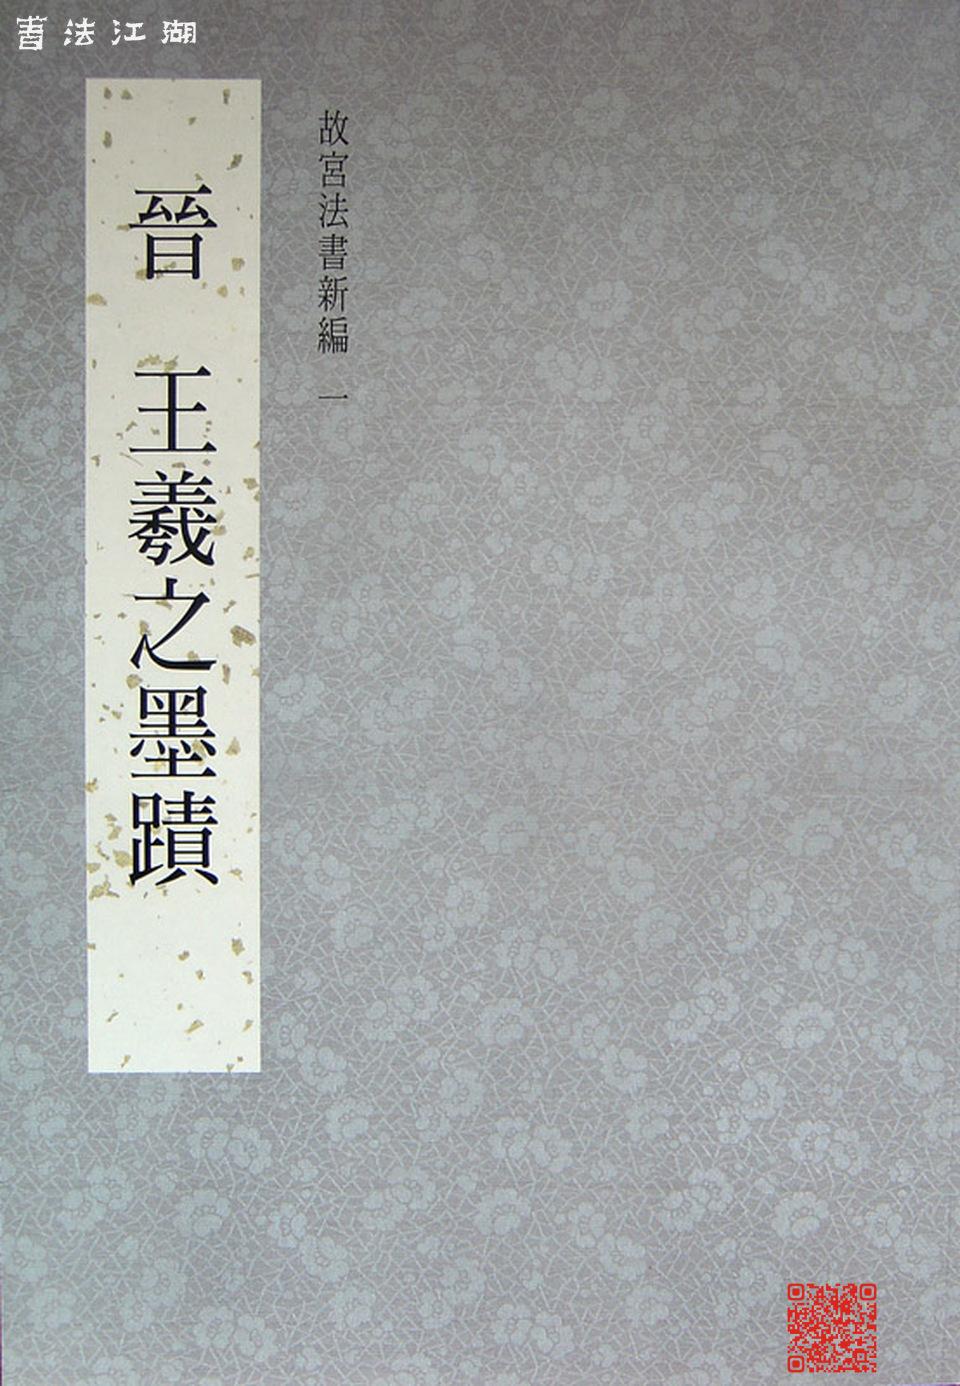 DSC03483.JPG